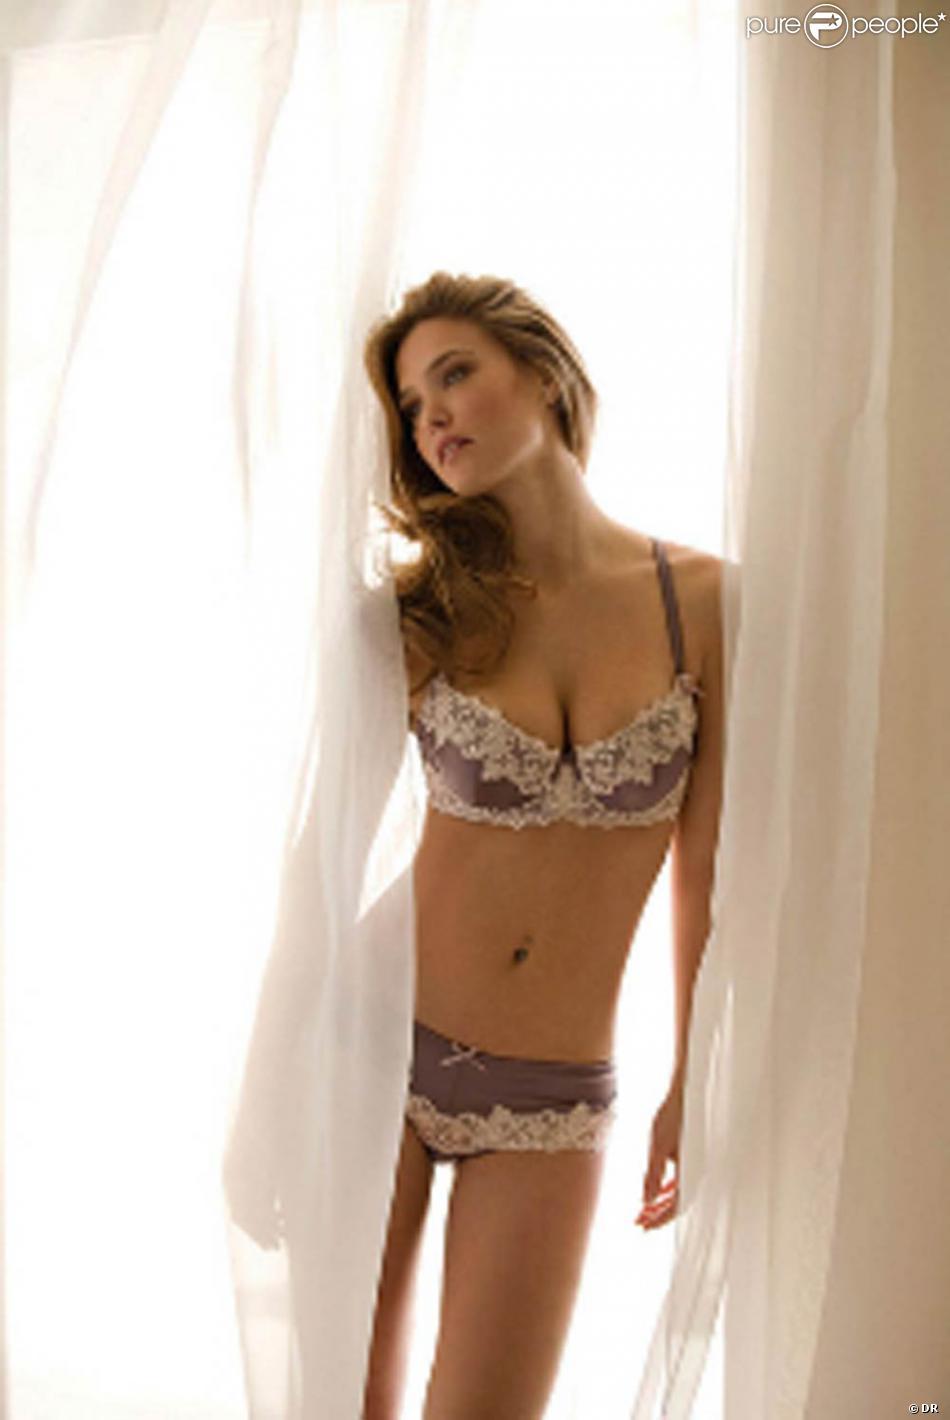 bb7fc5a37 La superbe Bar Refaeli pour la marque de lingerie Bonita de Mas ...